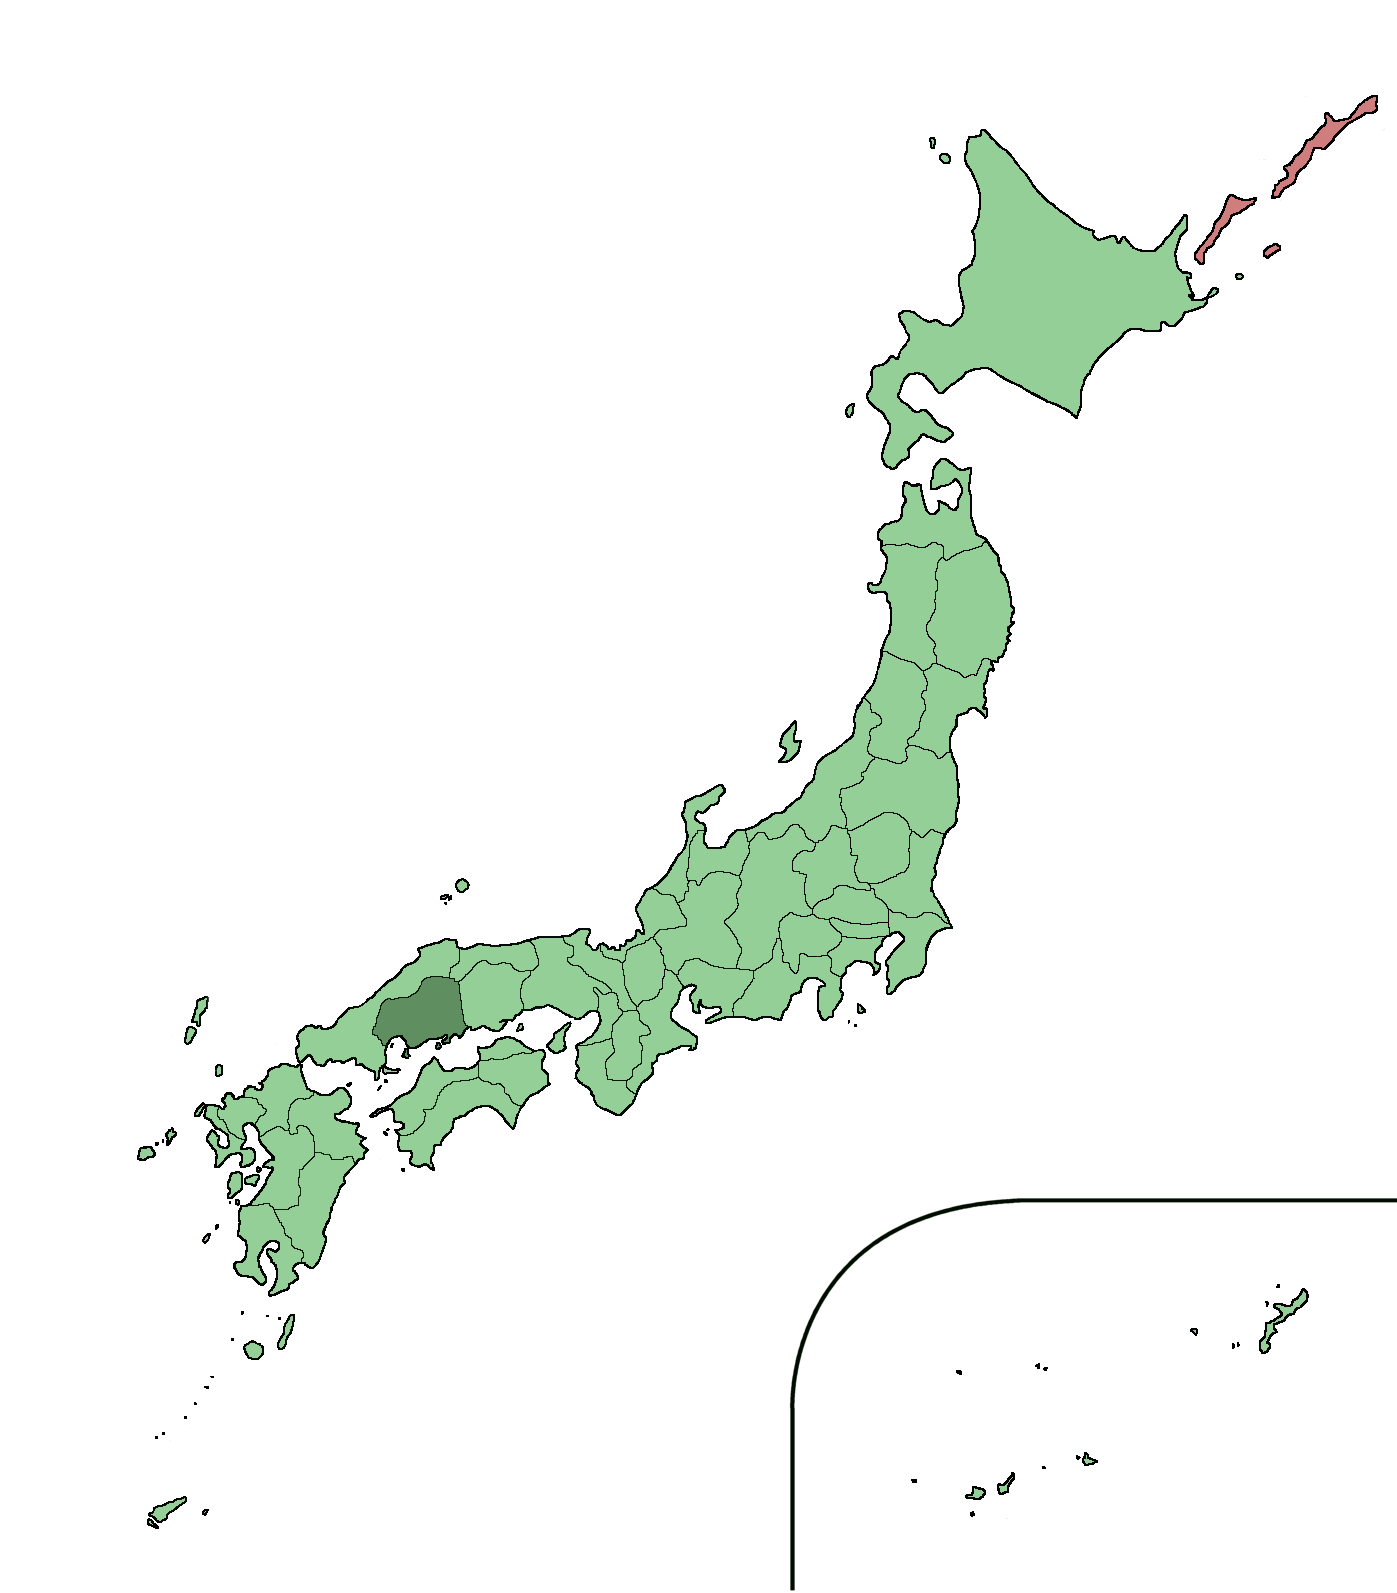 FileJapan Hiroshima Largepng Wikimedia Commons - Japan map hiroshima